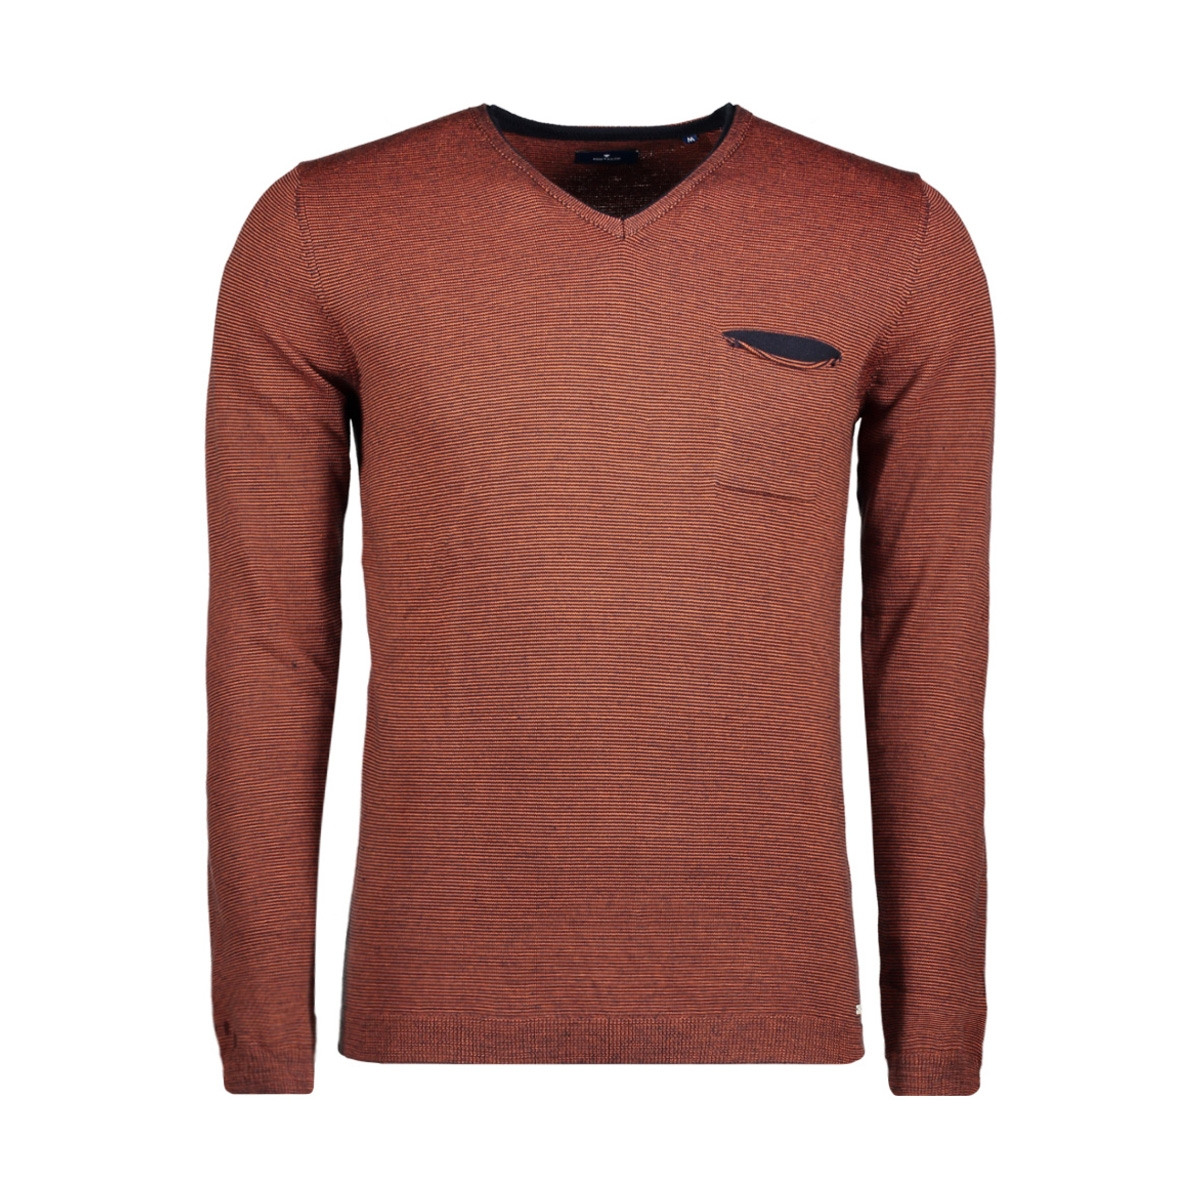 3022963.00.10 tom tailor t-shirt 3580